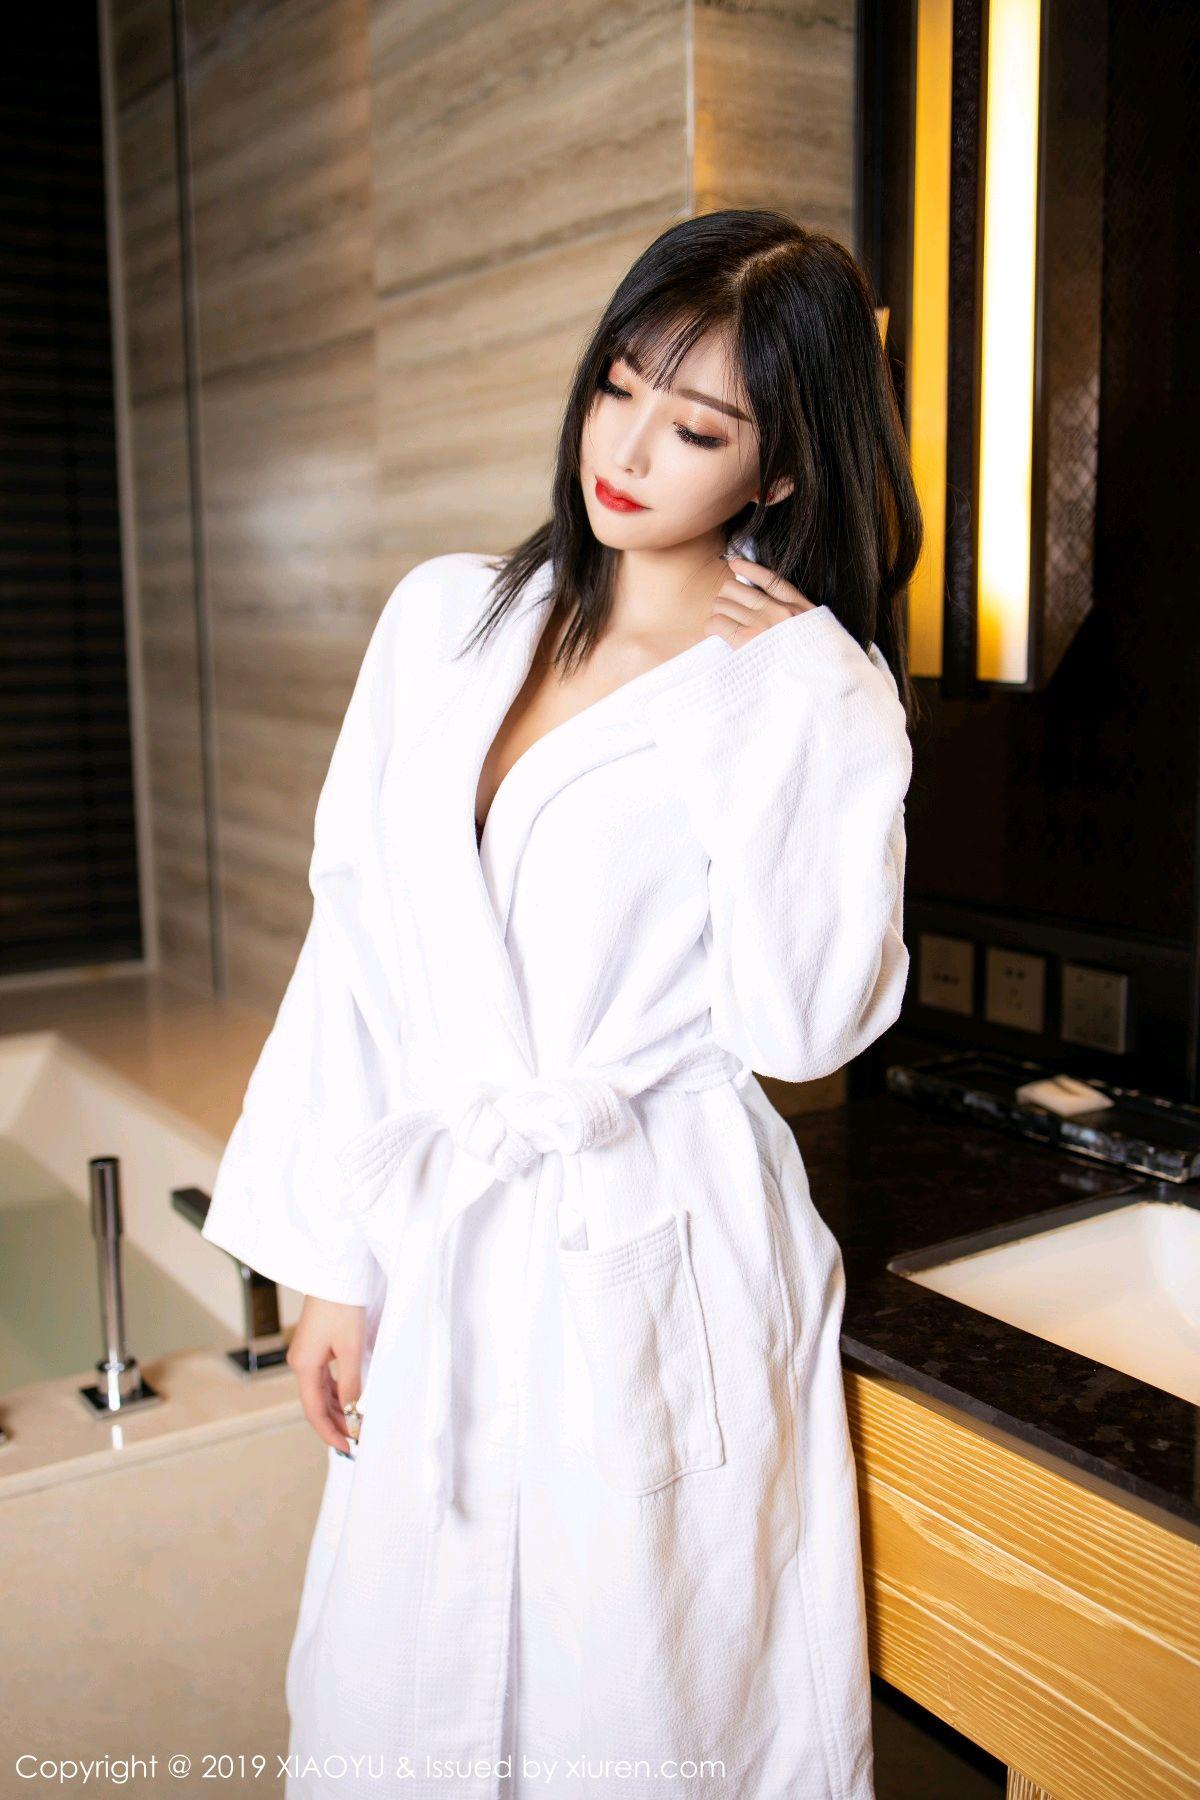 [XiaoYu] Vol.153 Yang Chen Chen 6P, Bathroom, Black Silk, Underwear, XiaoYu, Yang Chen Chen